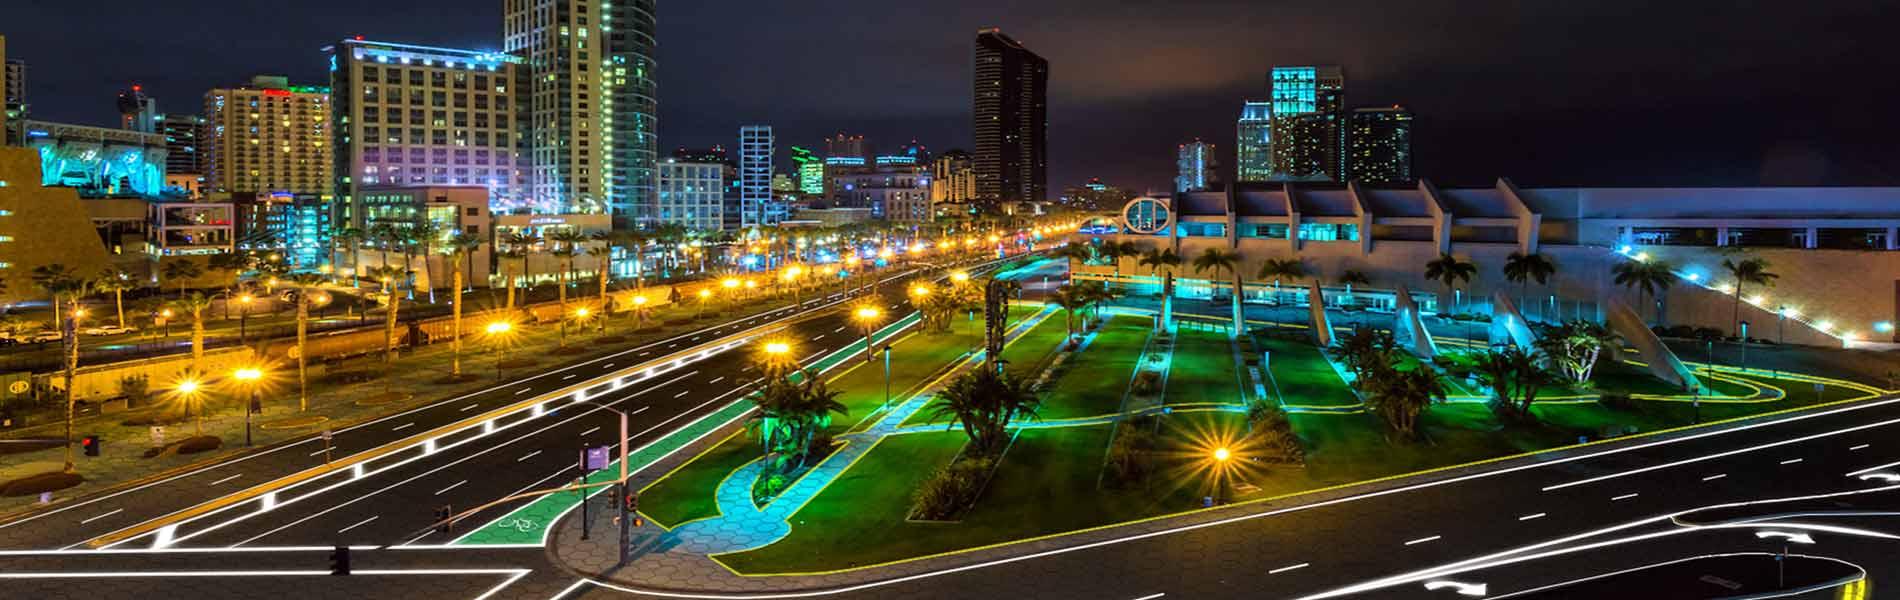 city-at-night-concept